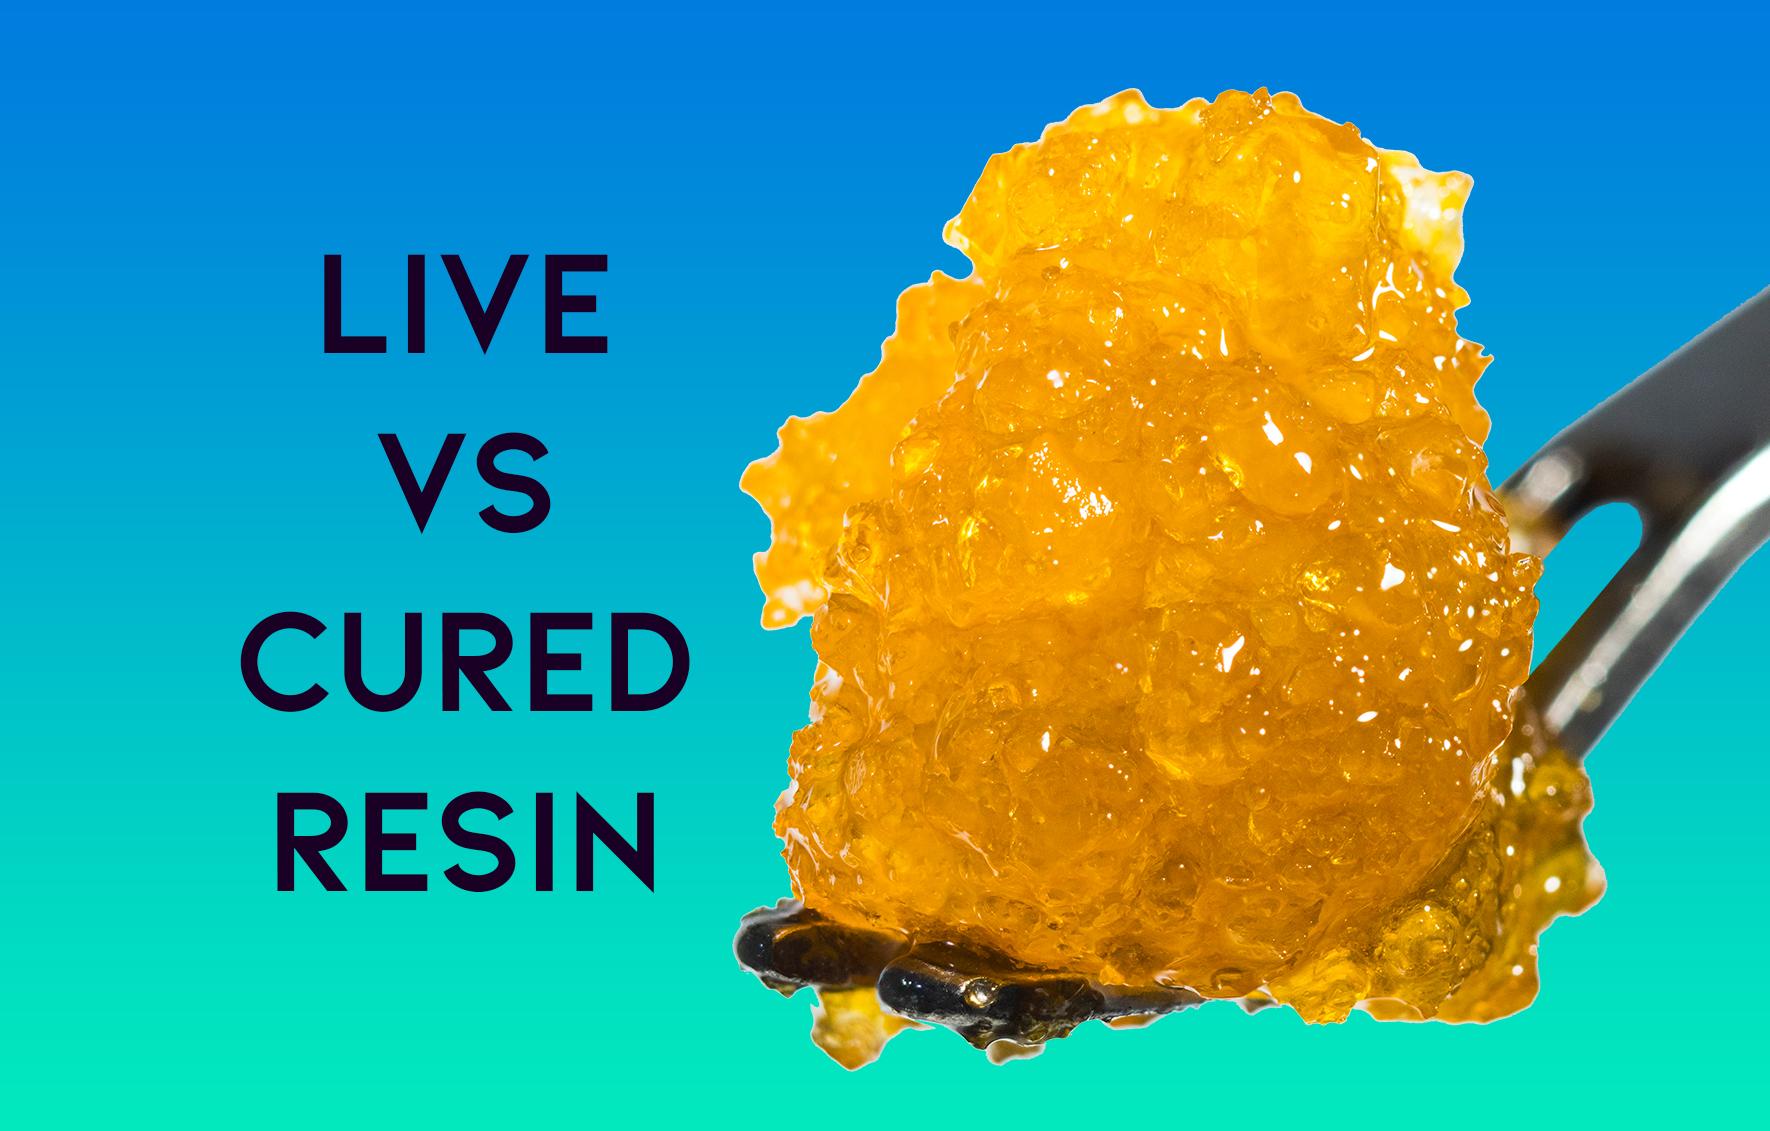 Live Vs. Cured Resin